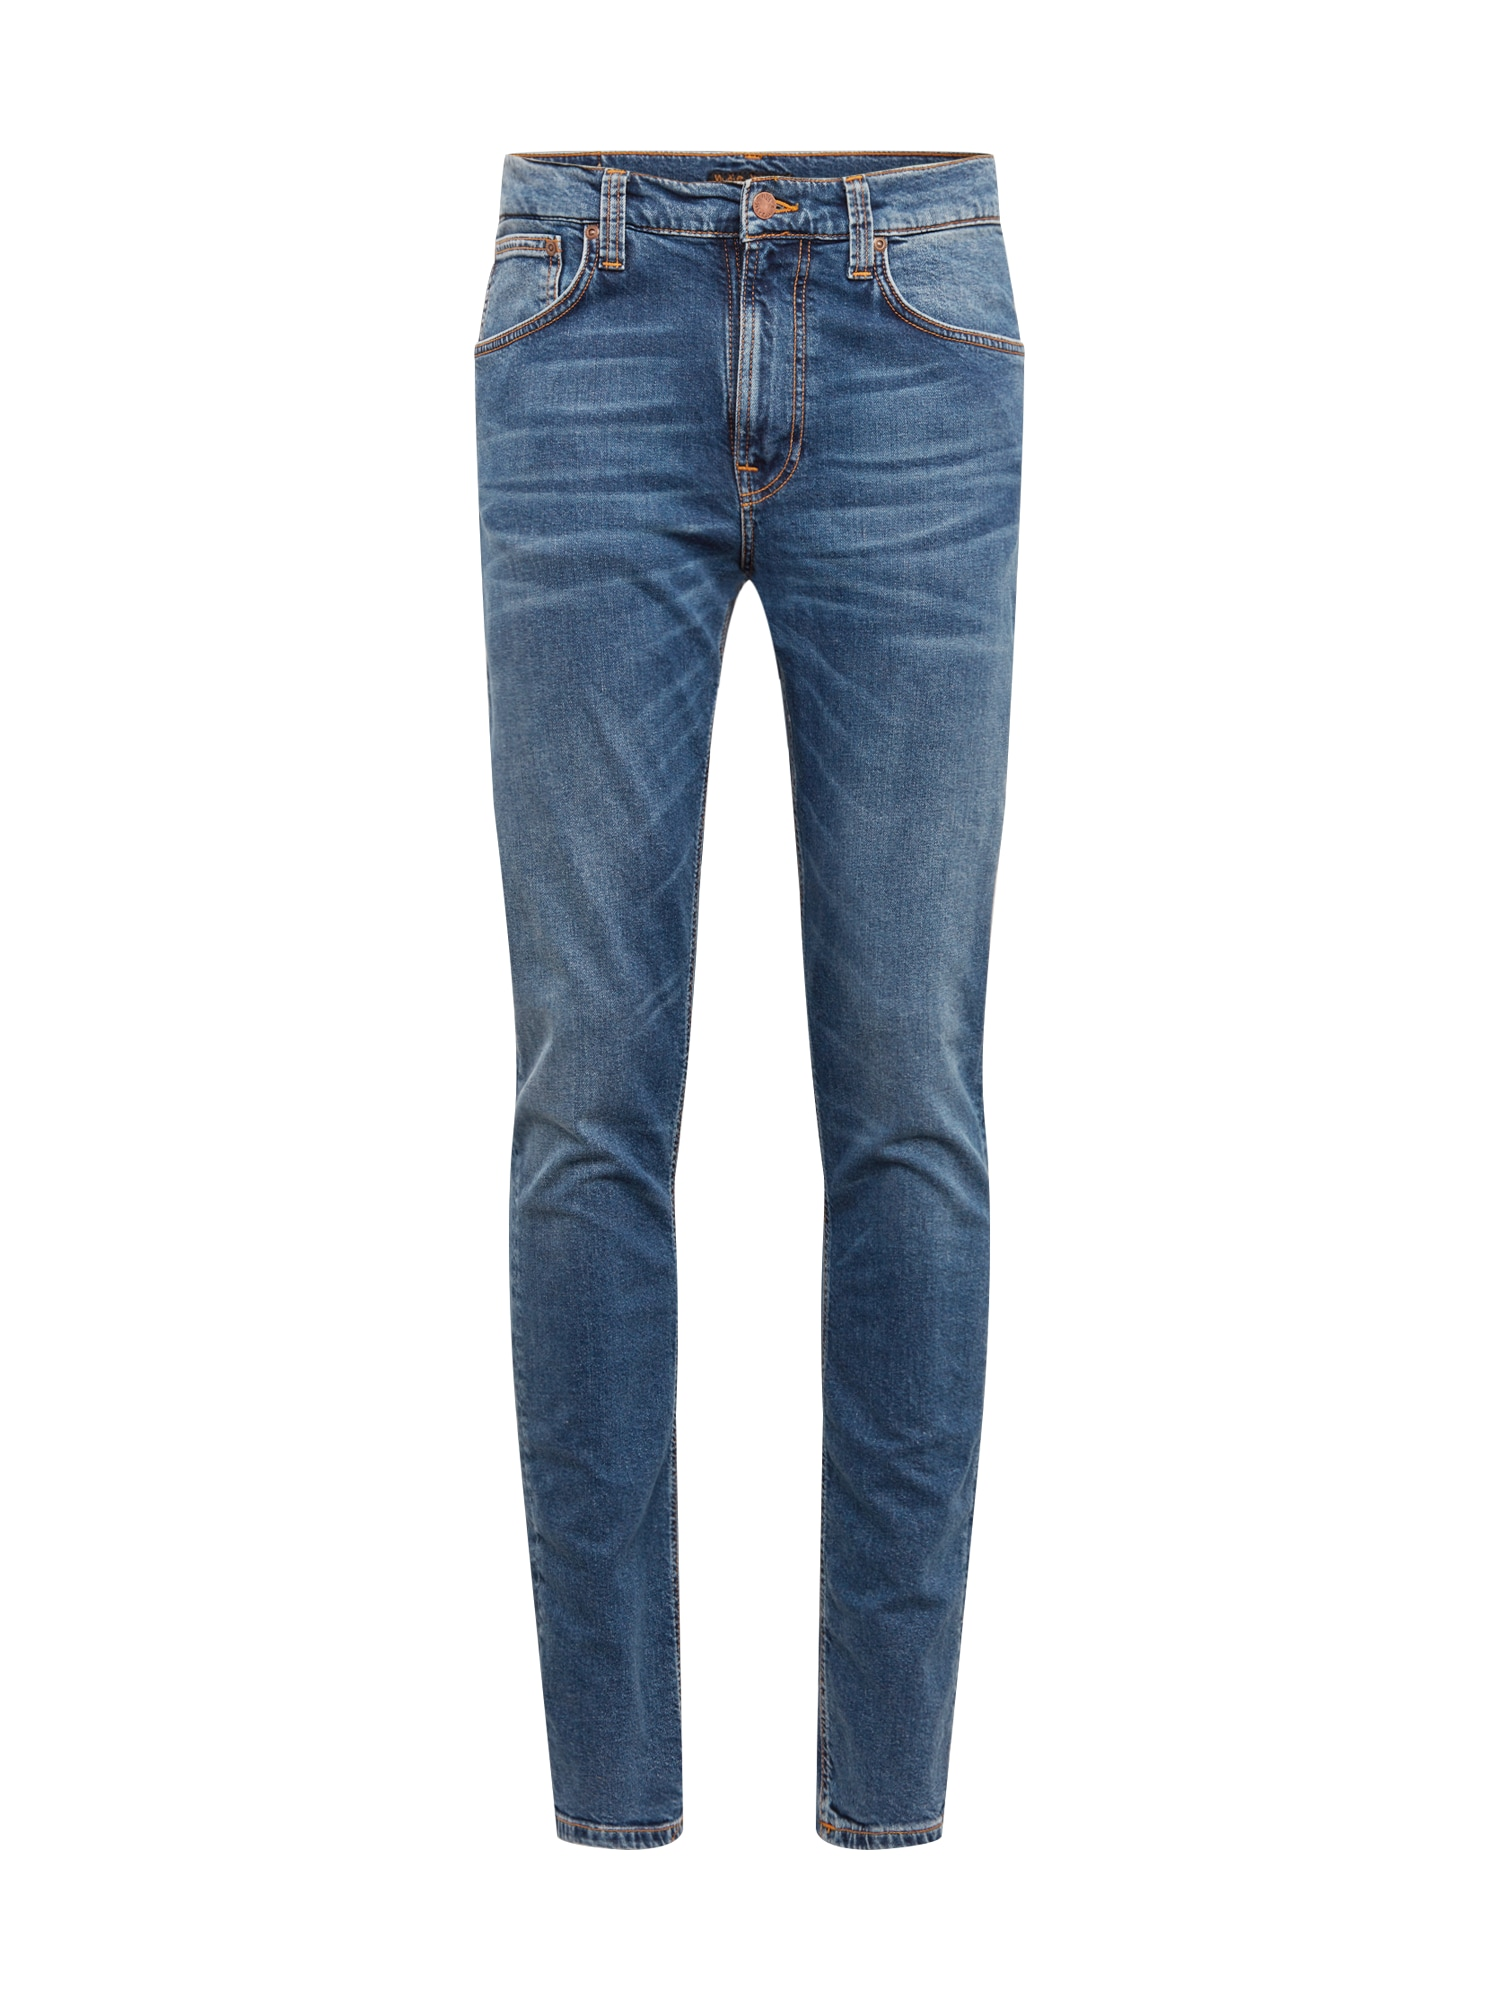 Džíny Lean Dean modrá Nudie Jeans Co